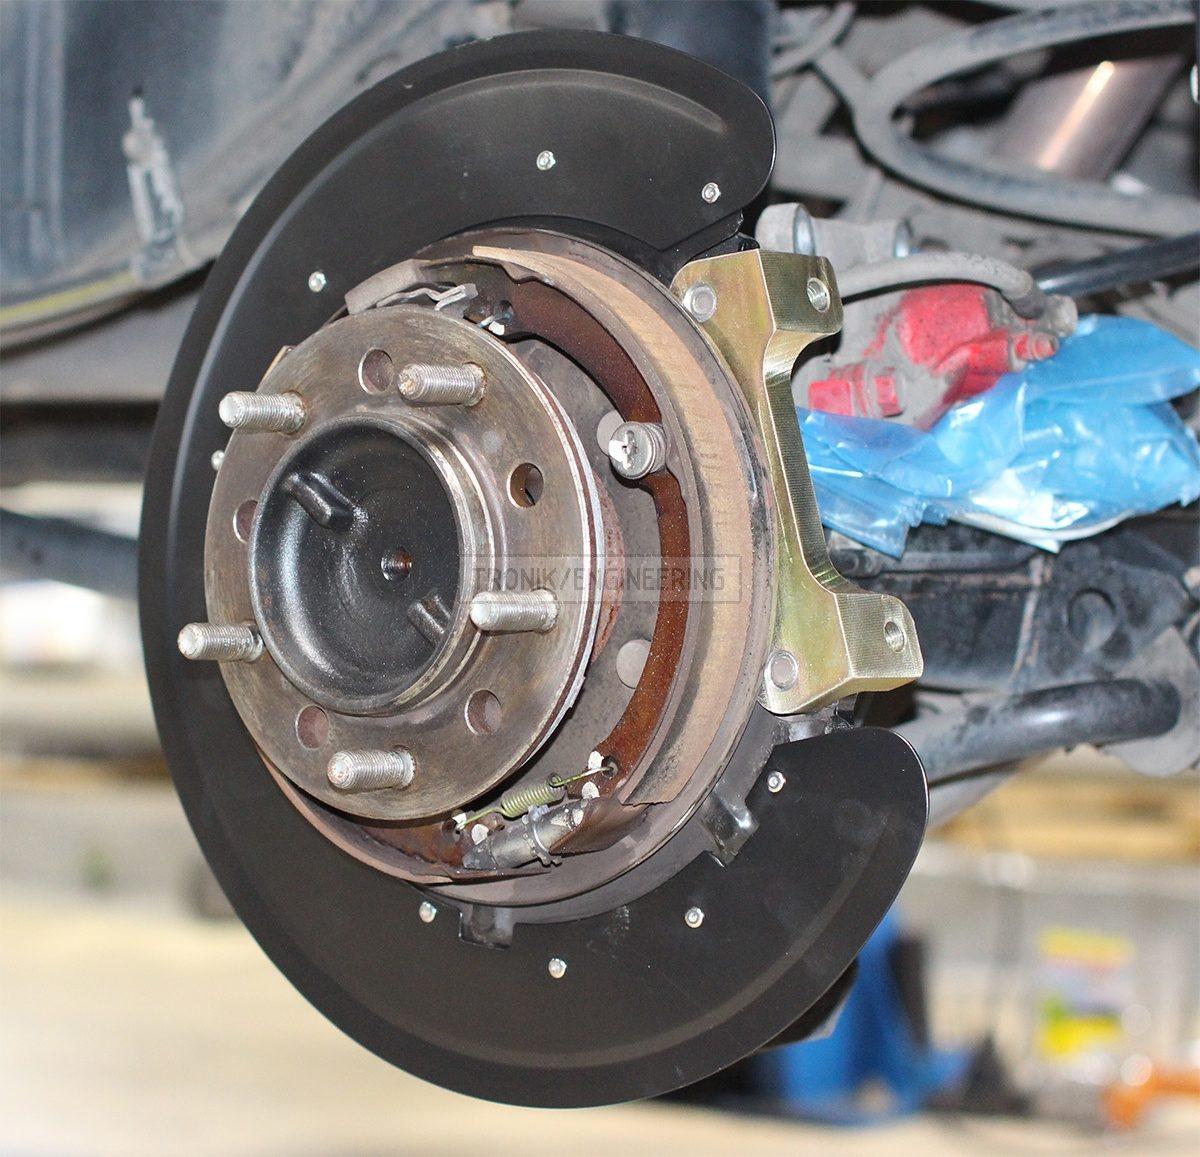 rear brake rotr protection & caliper adapter pic 3